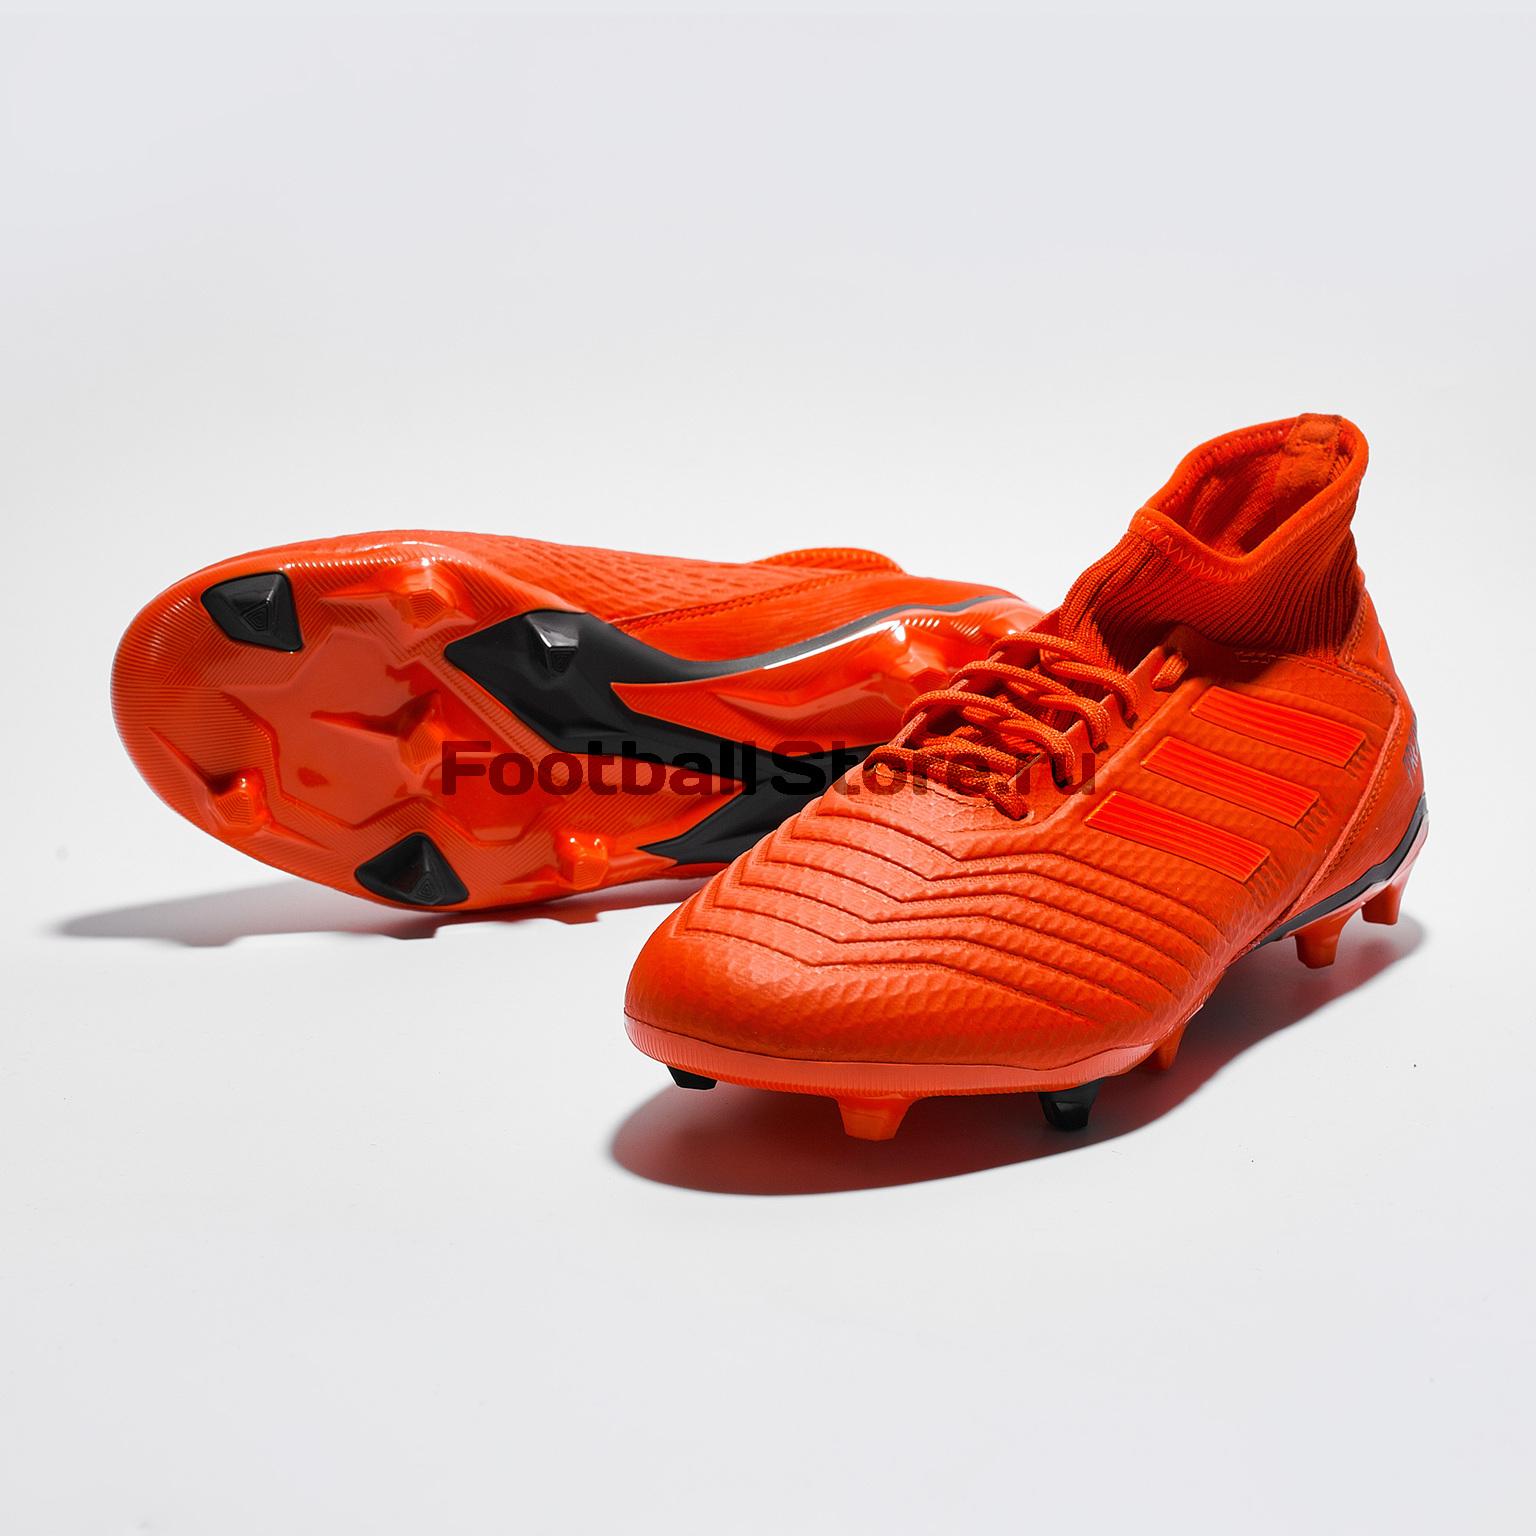 Бутсы Adidas Predator 19.3 FG BB9334 adidas predator lite g73412